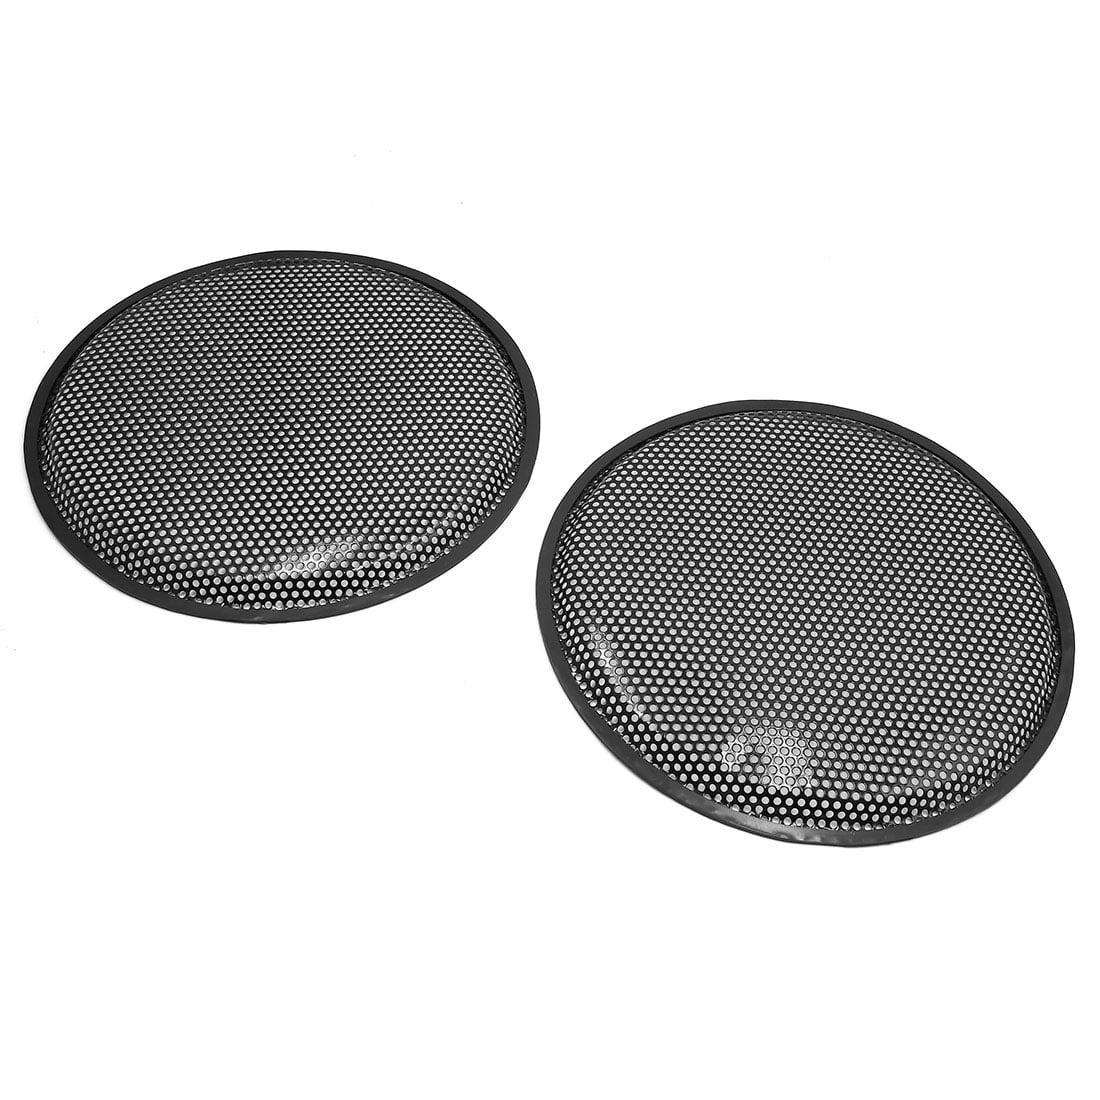 "2pcs 12"" Car Waffle Speaker Mesh Cover Subwoofer Protector Enclosure Grill Guard"